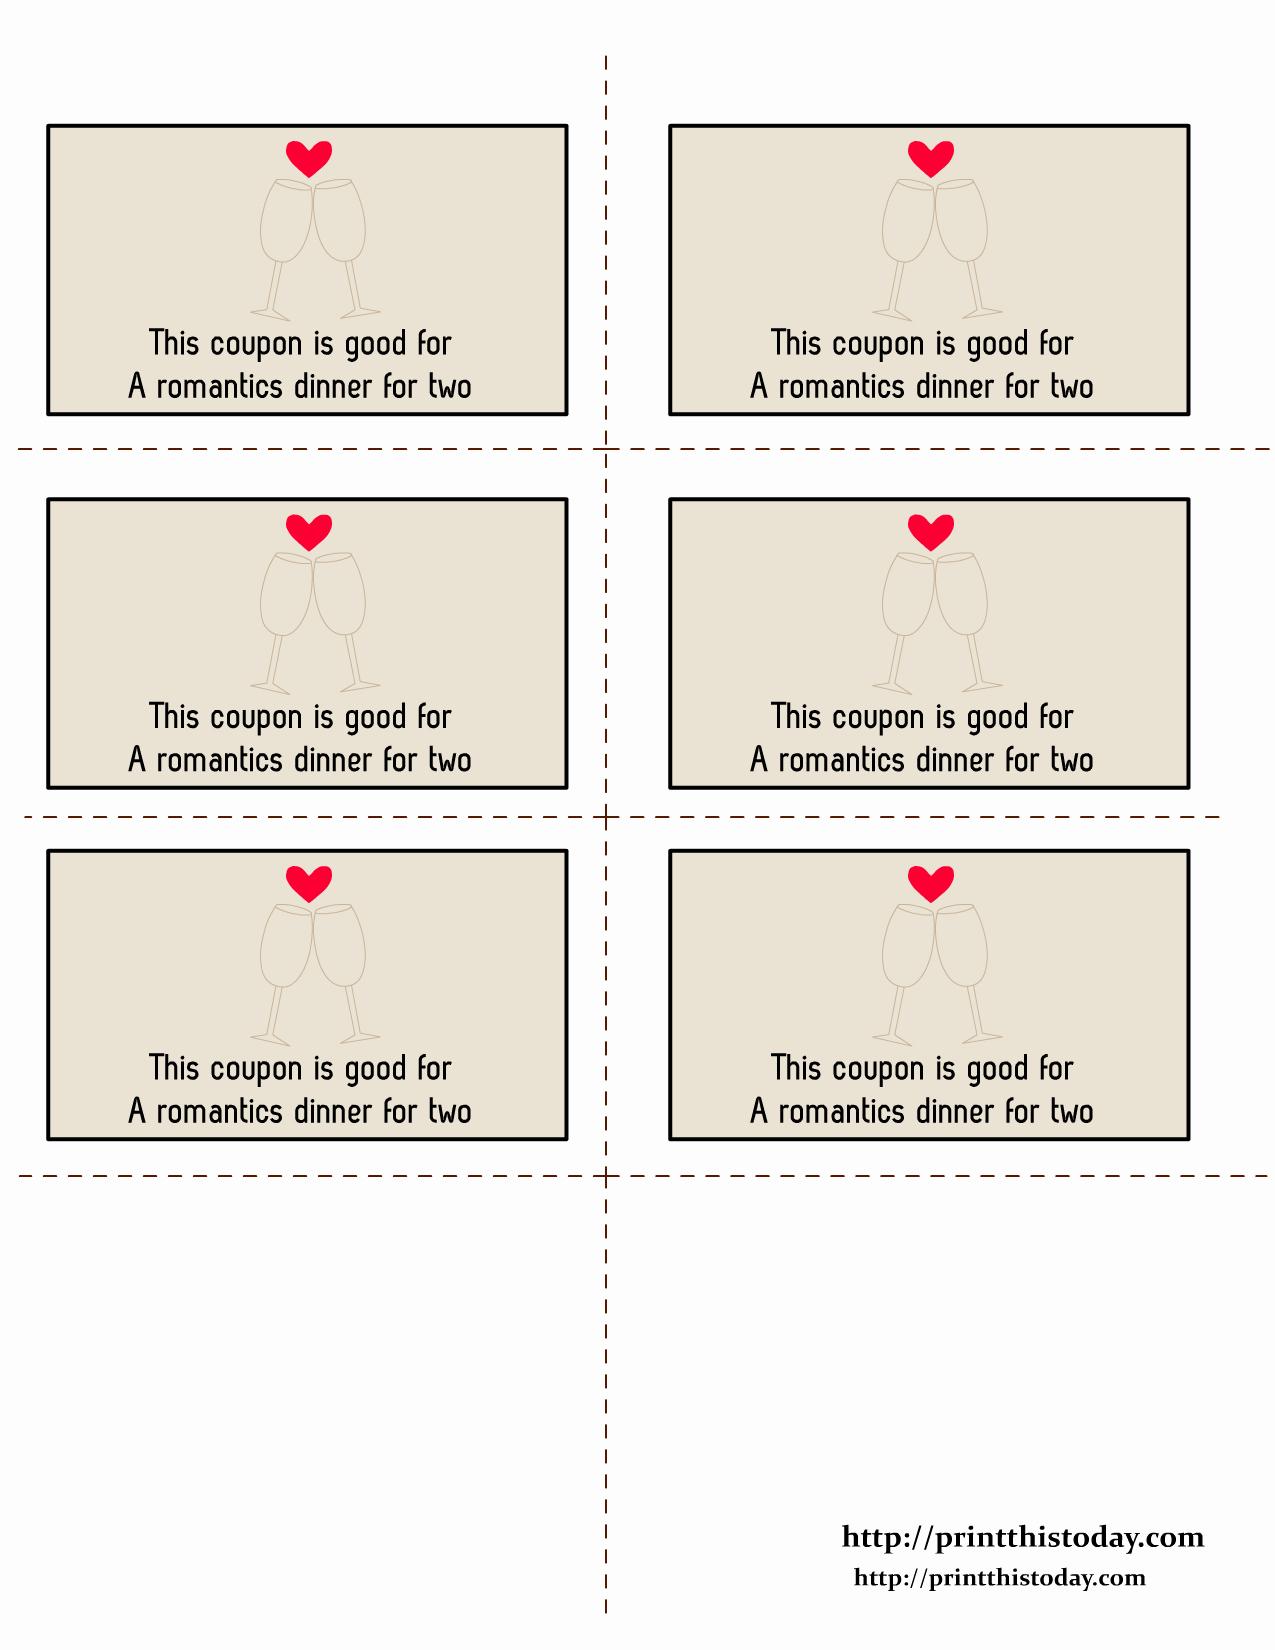 Free Printable Coupon Template Blank New Free Printable Love Coupons